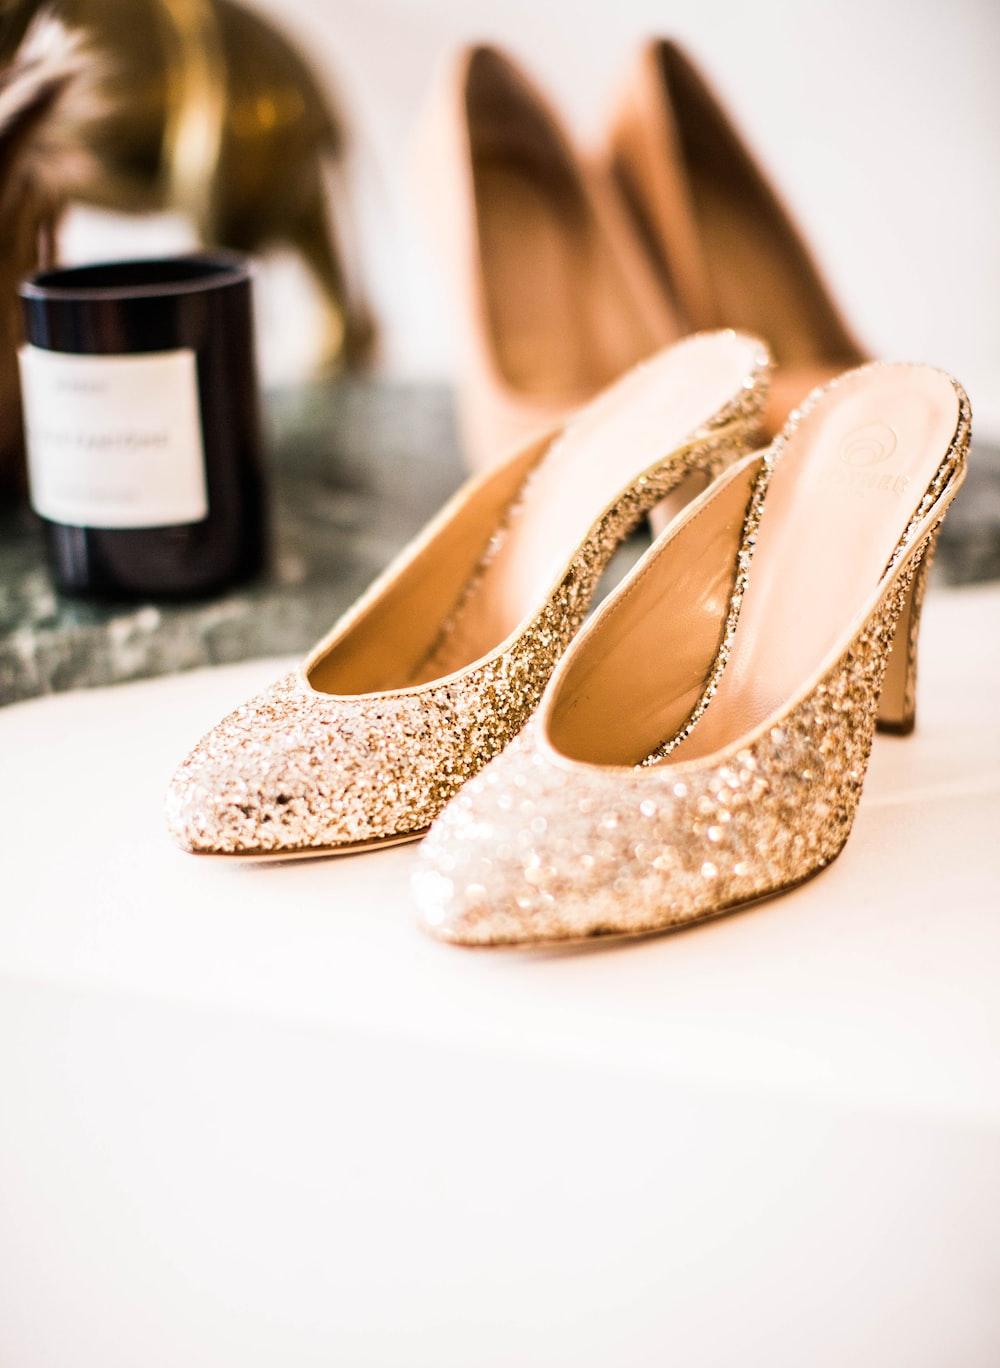 Polka dot wedding shoes photo by Thomas William (@thomasw) on Unsplash